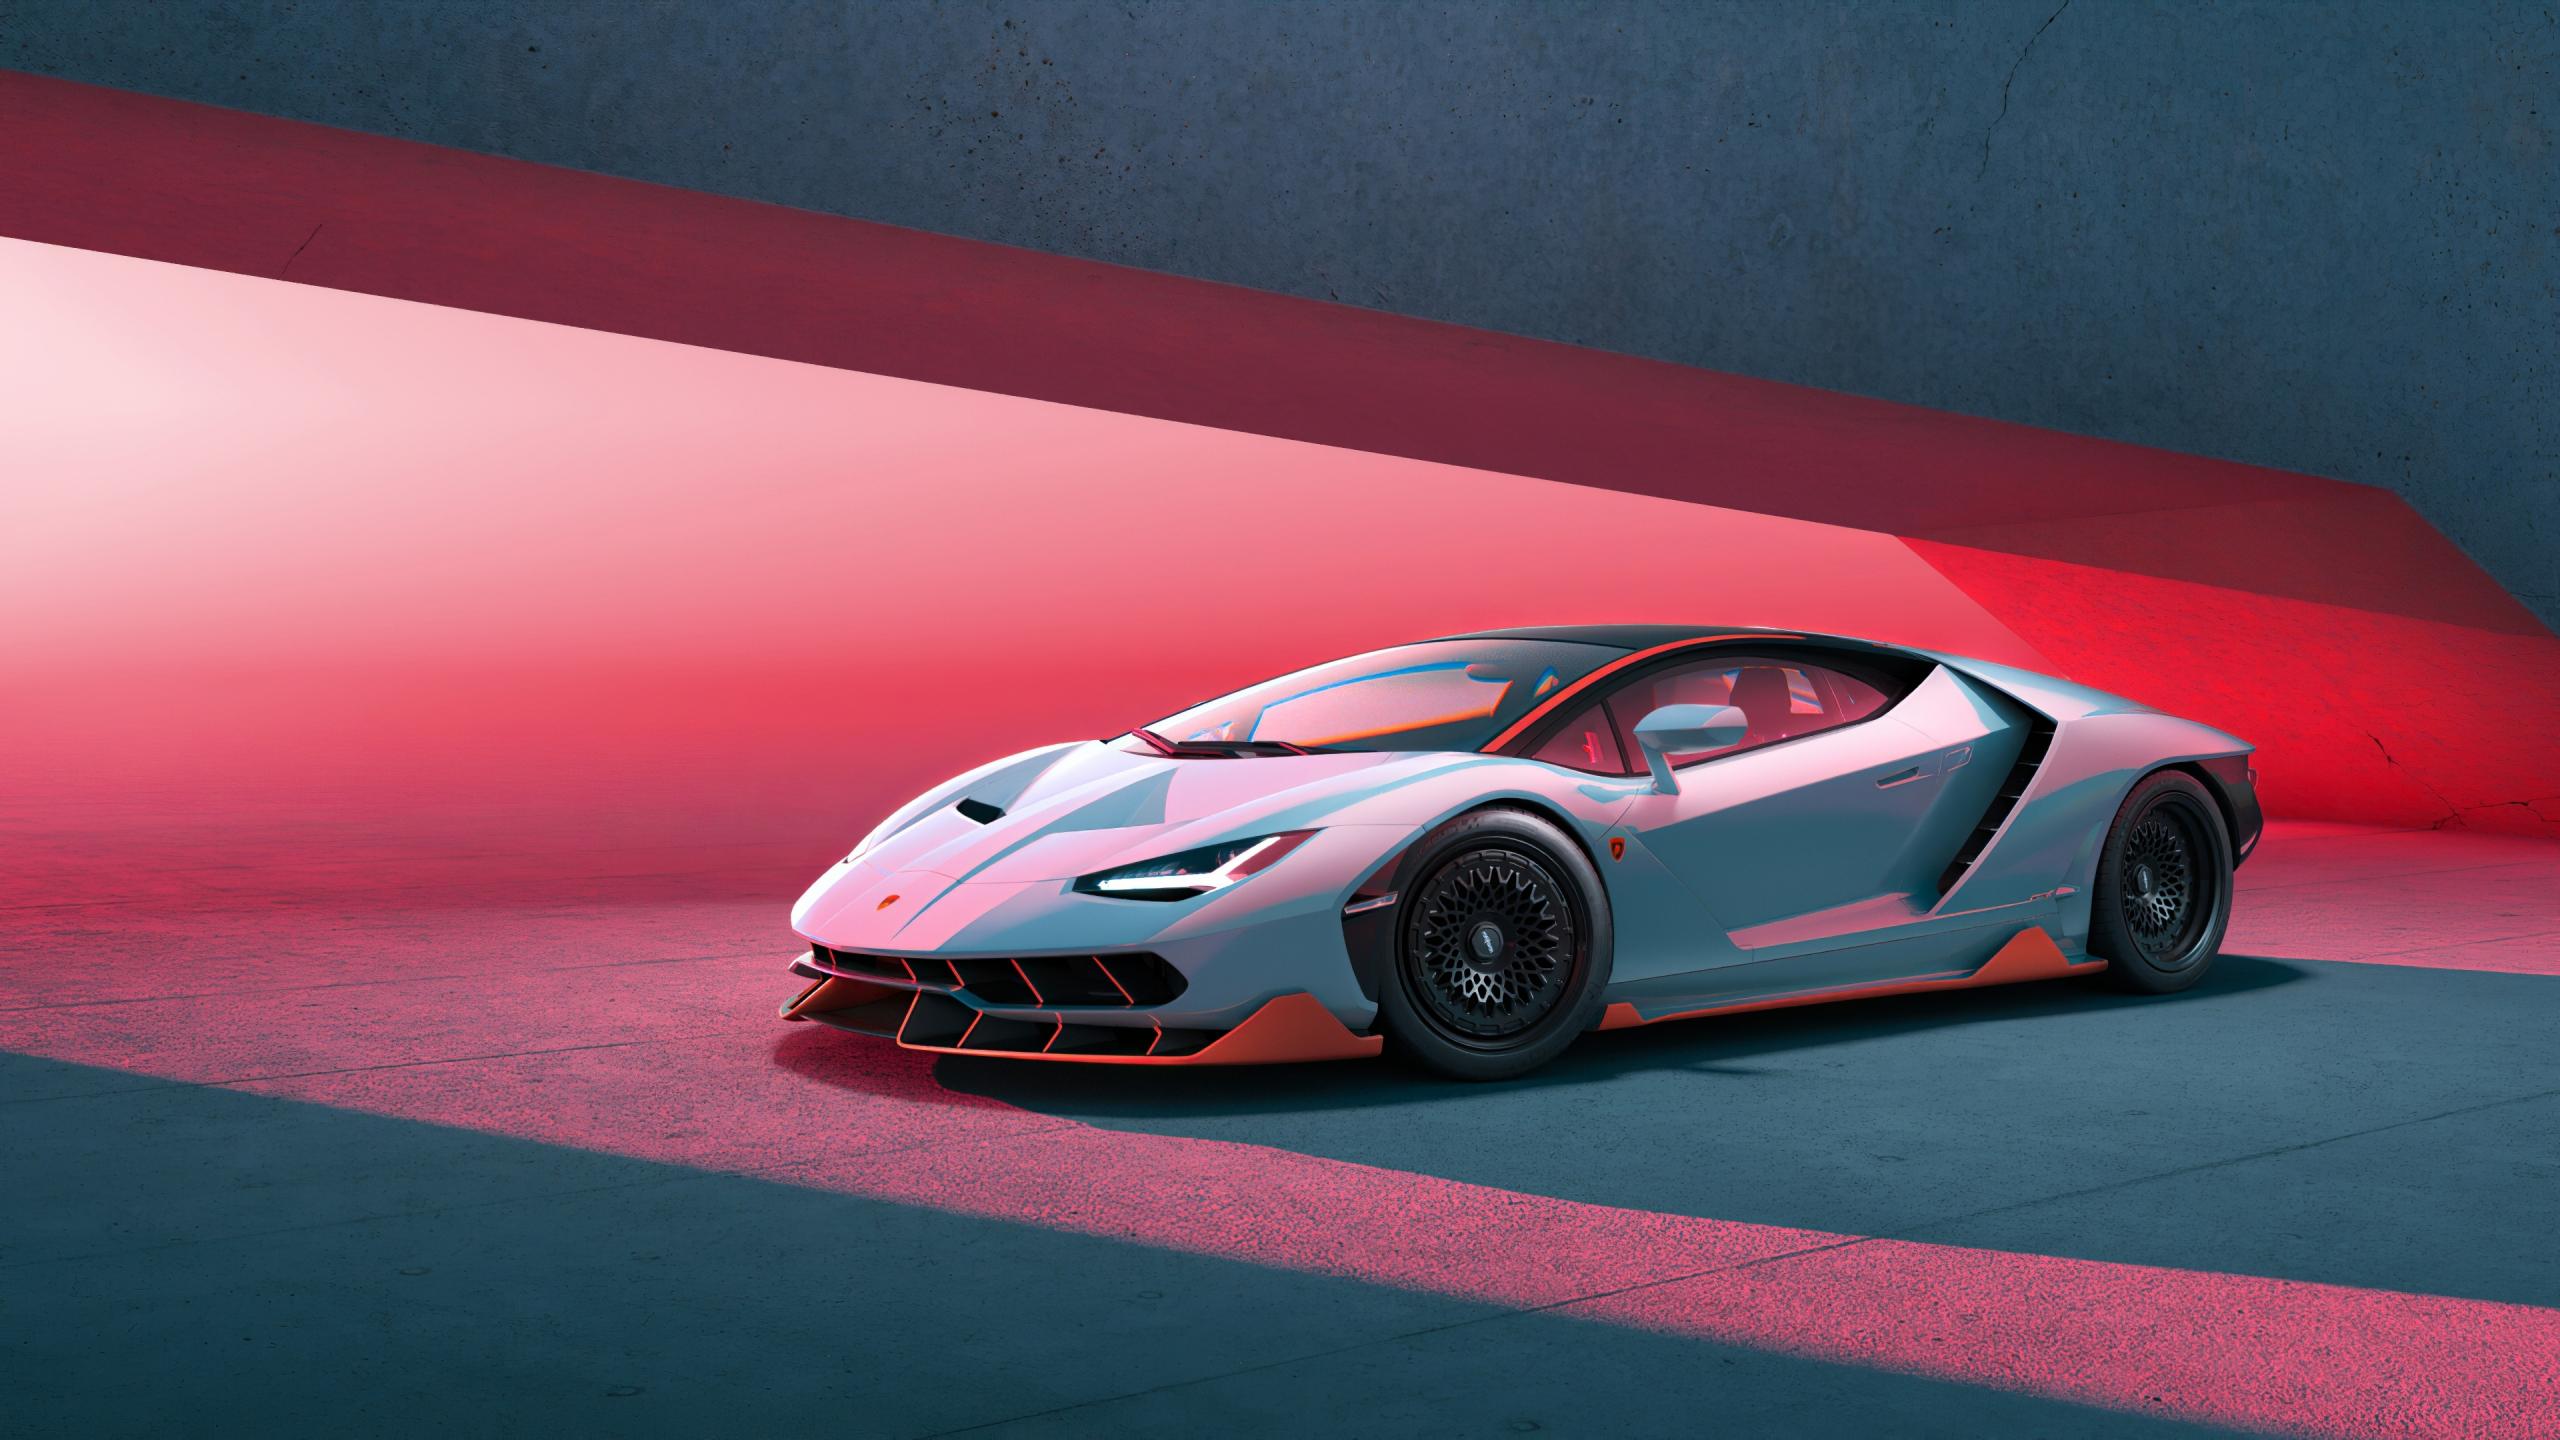 Sizing also makes later remov. Download 2560x1440 Wallpaper Car Sportcar Lamborghini Artwork Dual Wide Widescreen 16 9 Widescreen 2560x1440 Hd Image Background 25223